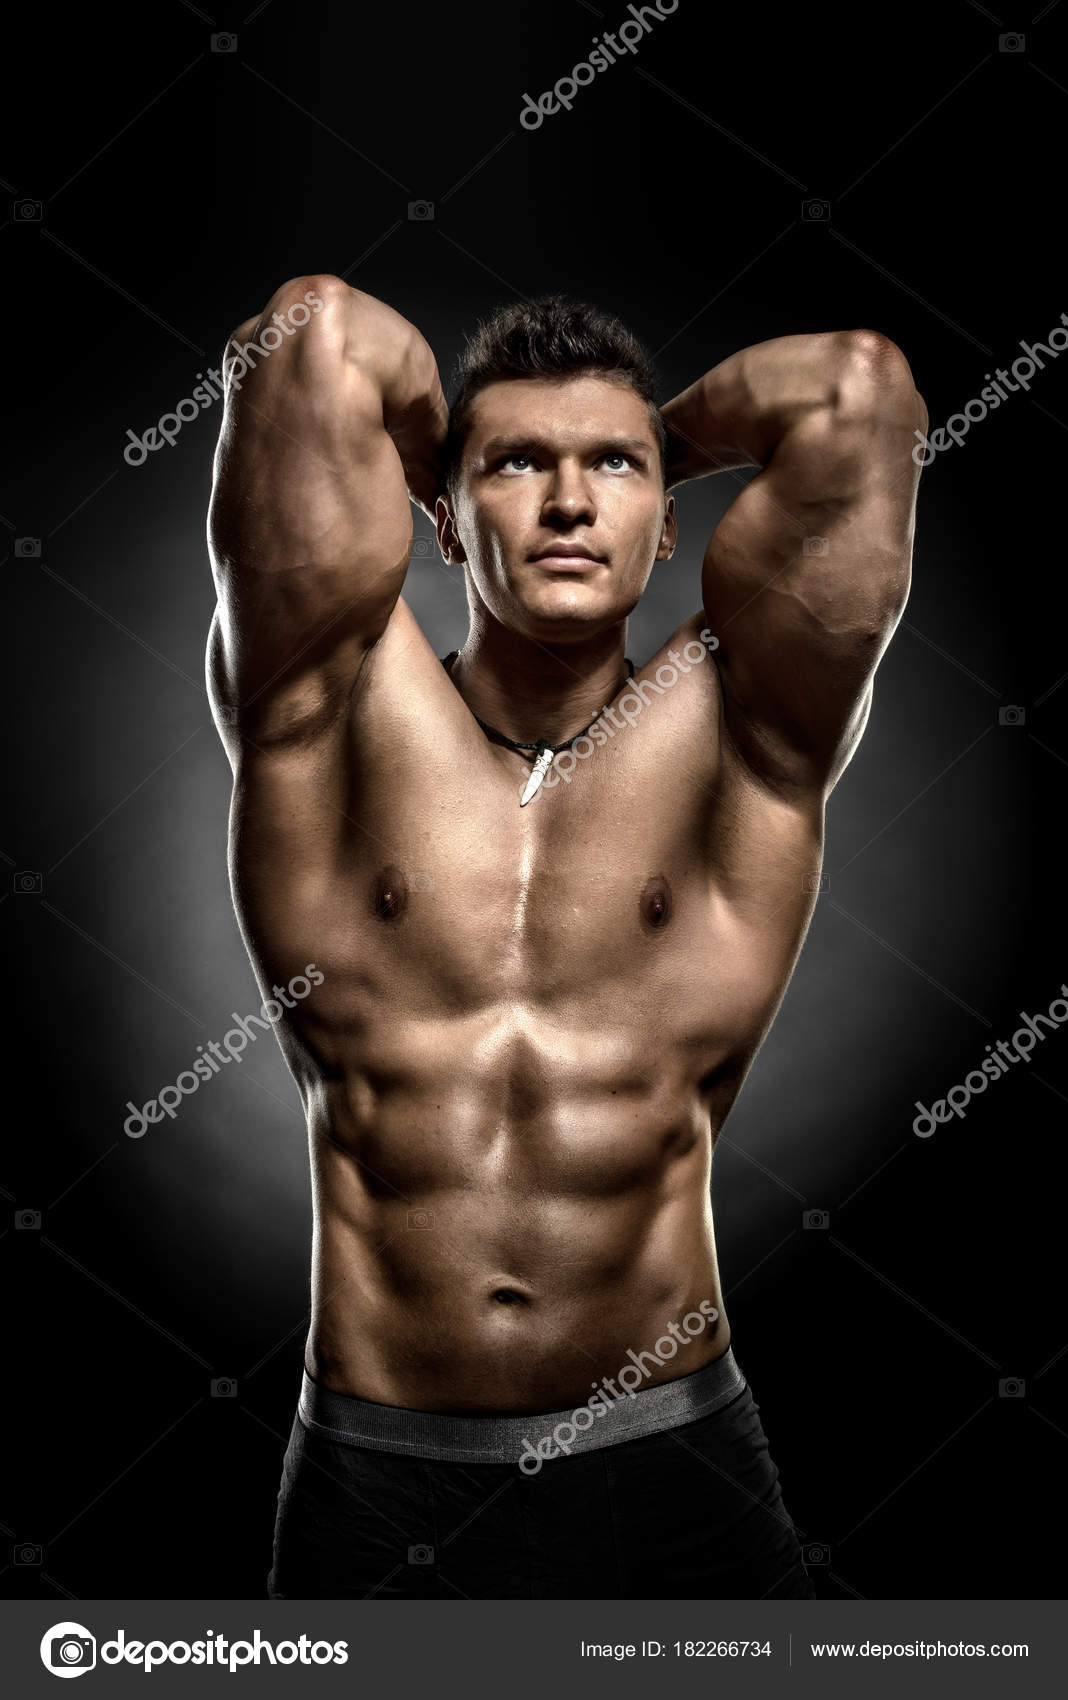 Фото мускулистые парни негри 9